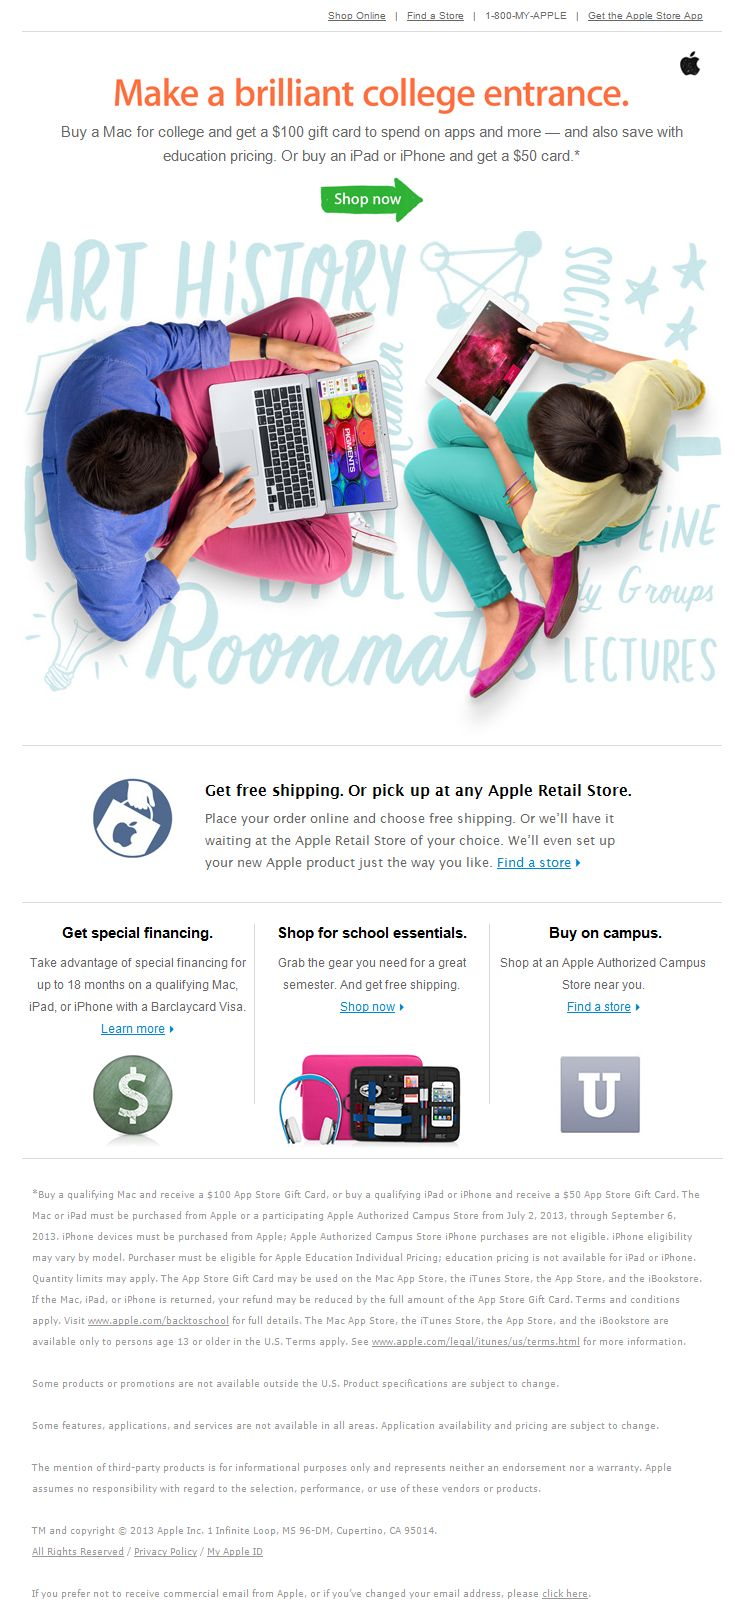 Fall backtoschool email by rakuten back to school